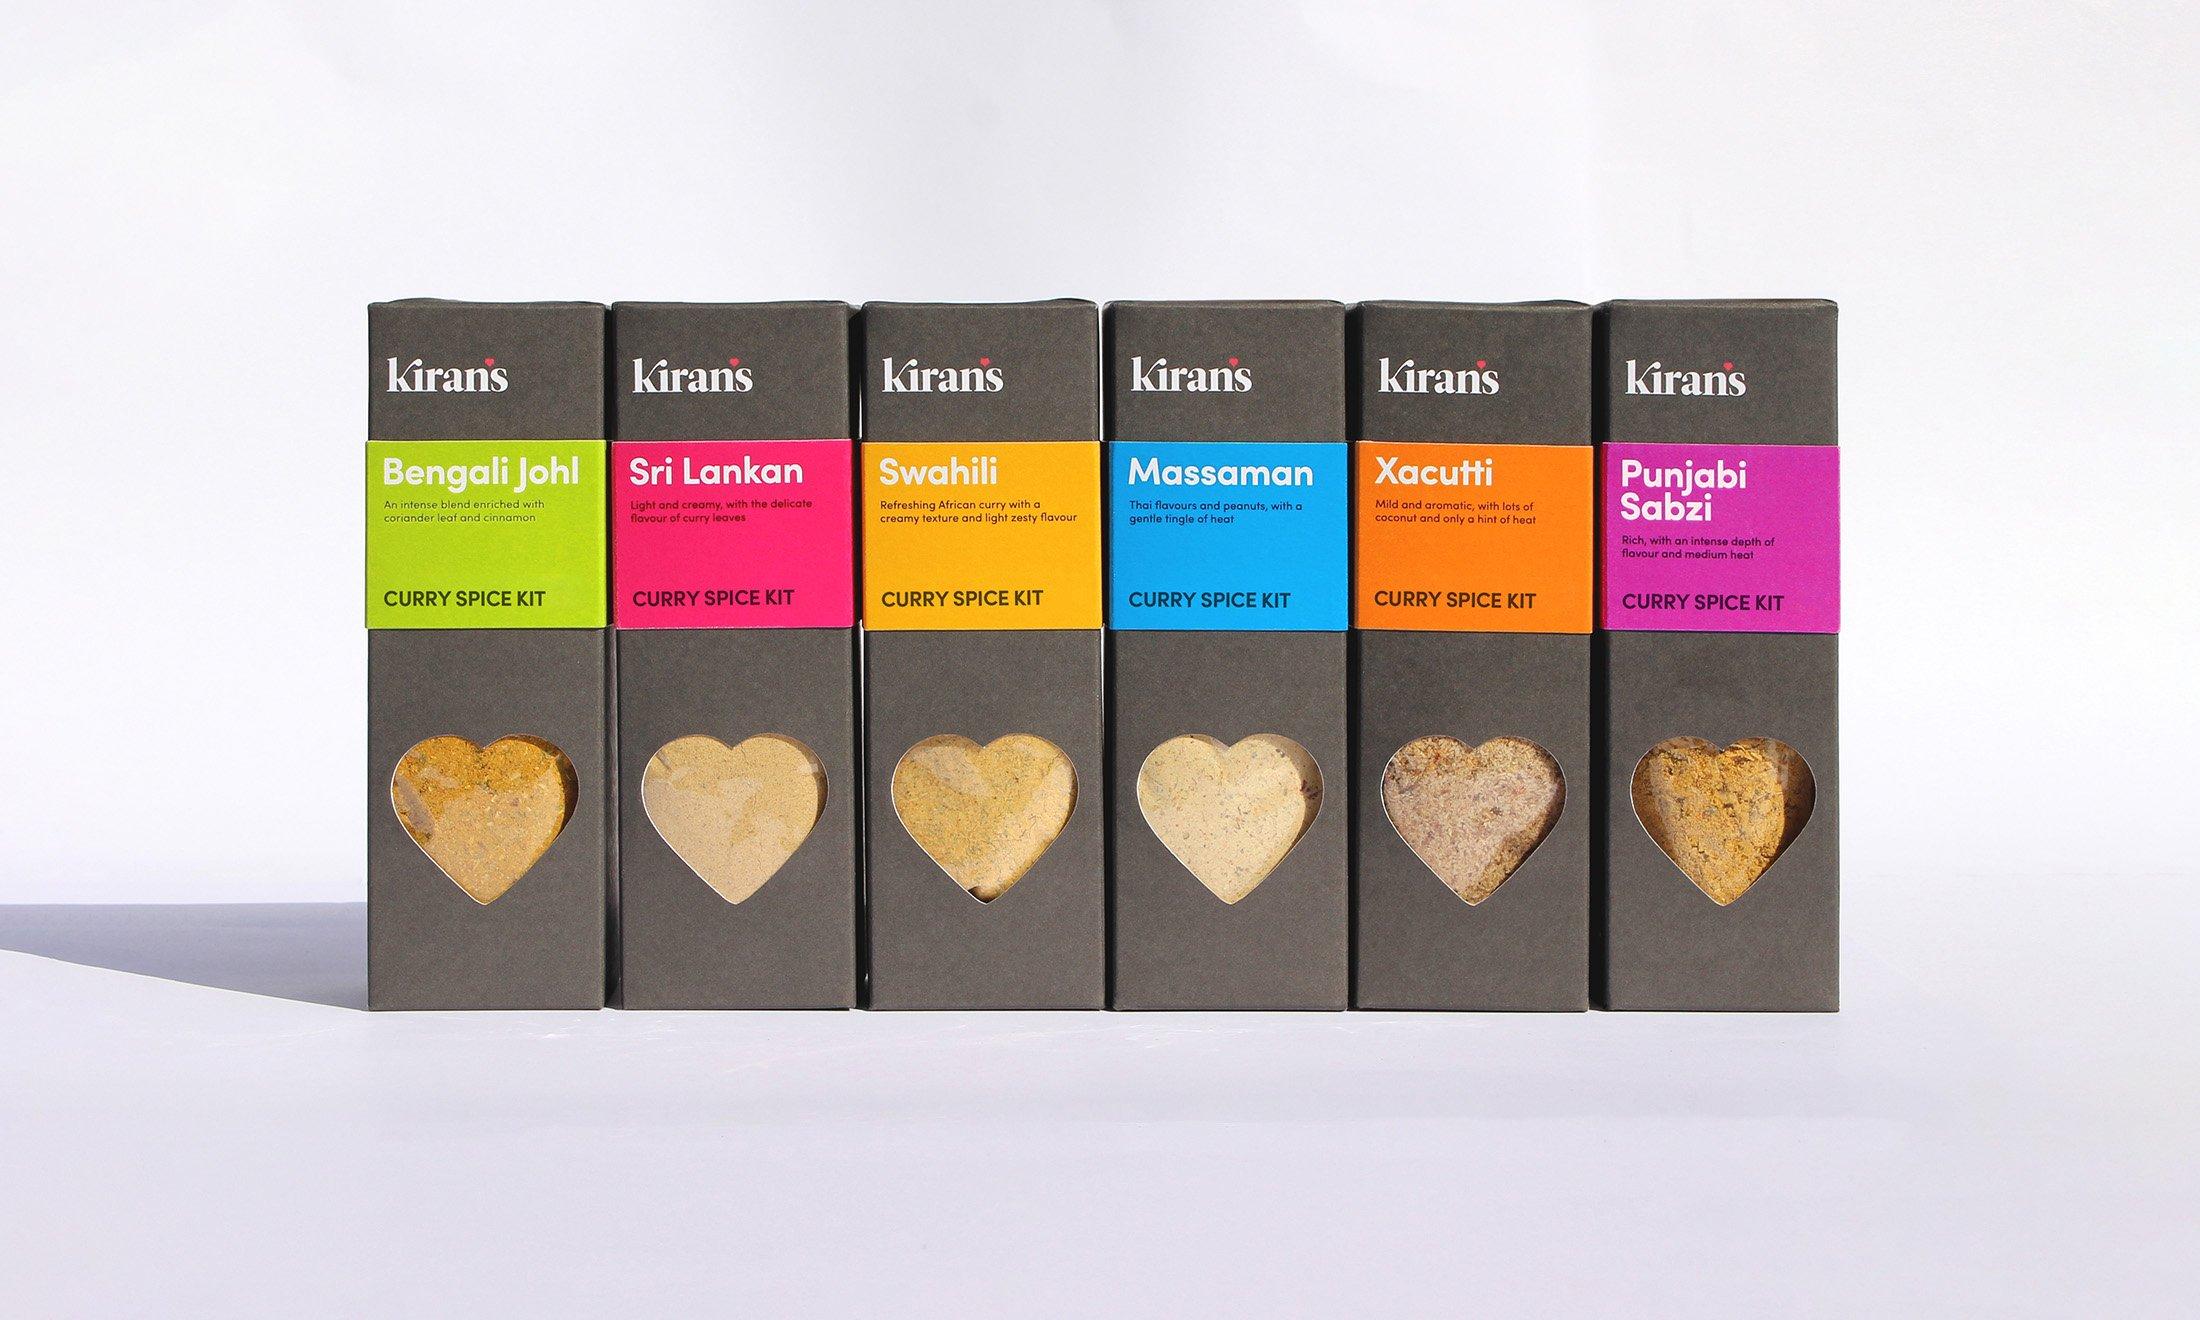 Simpkin Burley Kiran's packaging creative